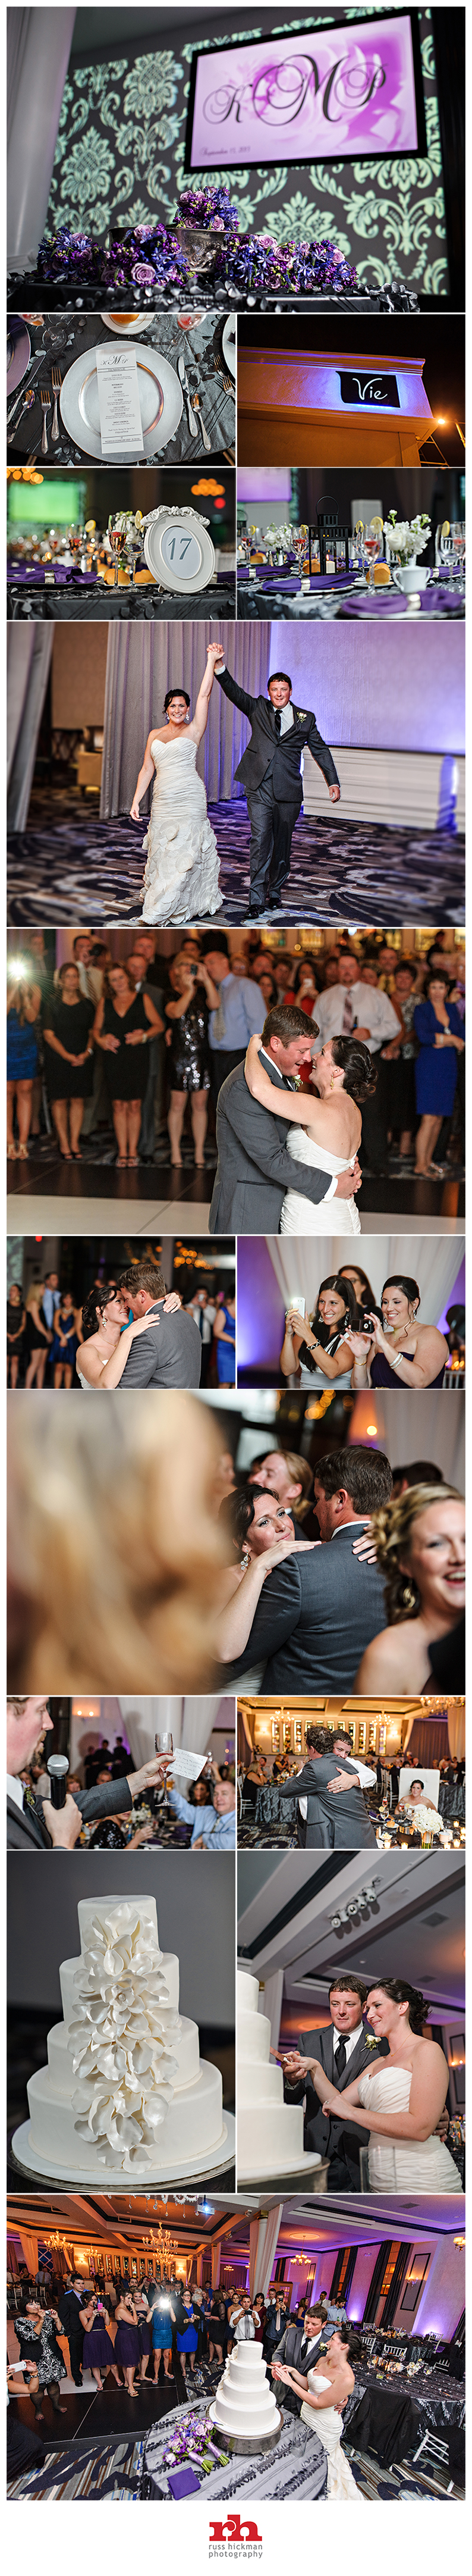 Philadelphia Wedding Photographer KPW009